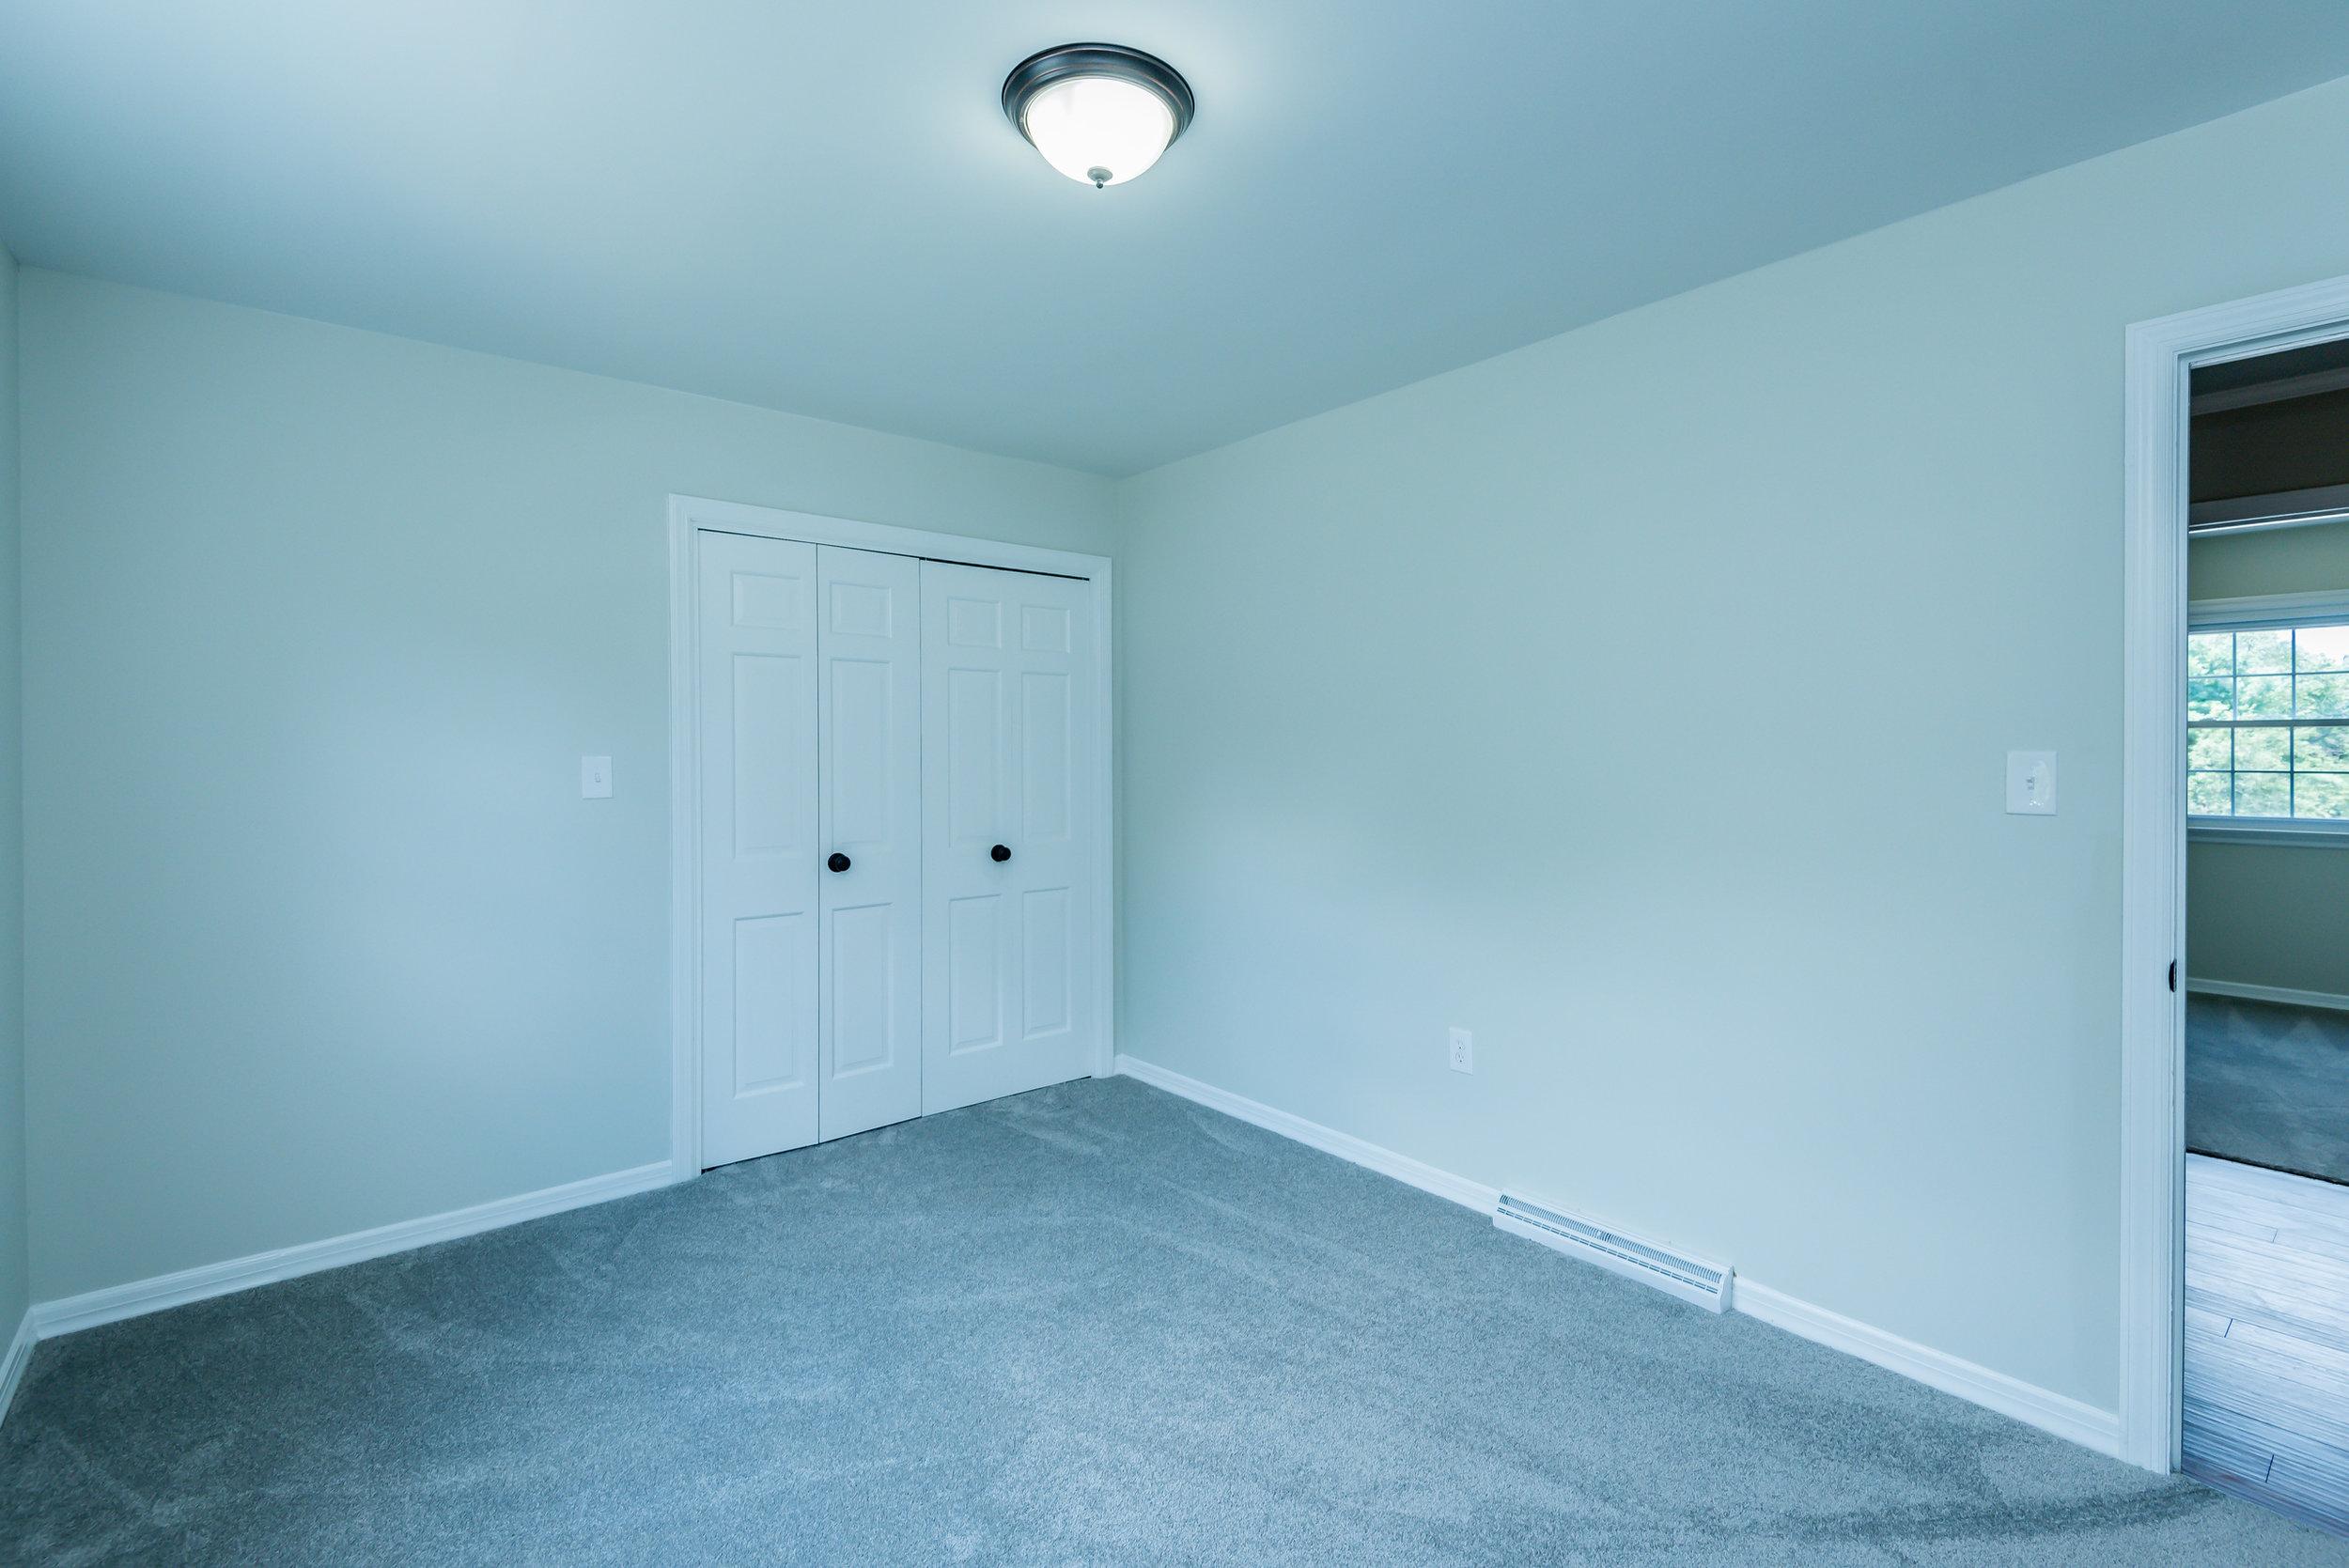 room_4_1_of_1_-2.jpg